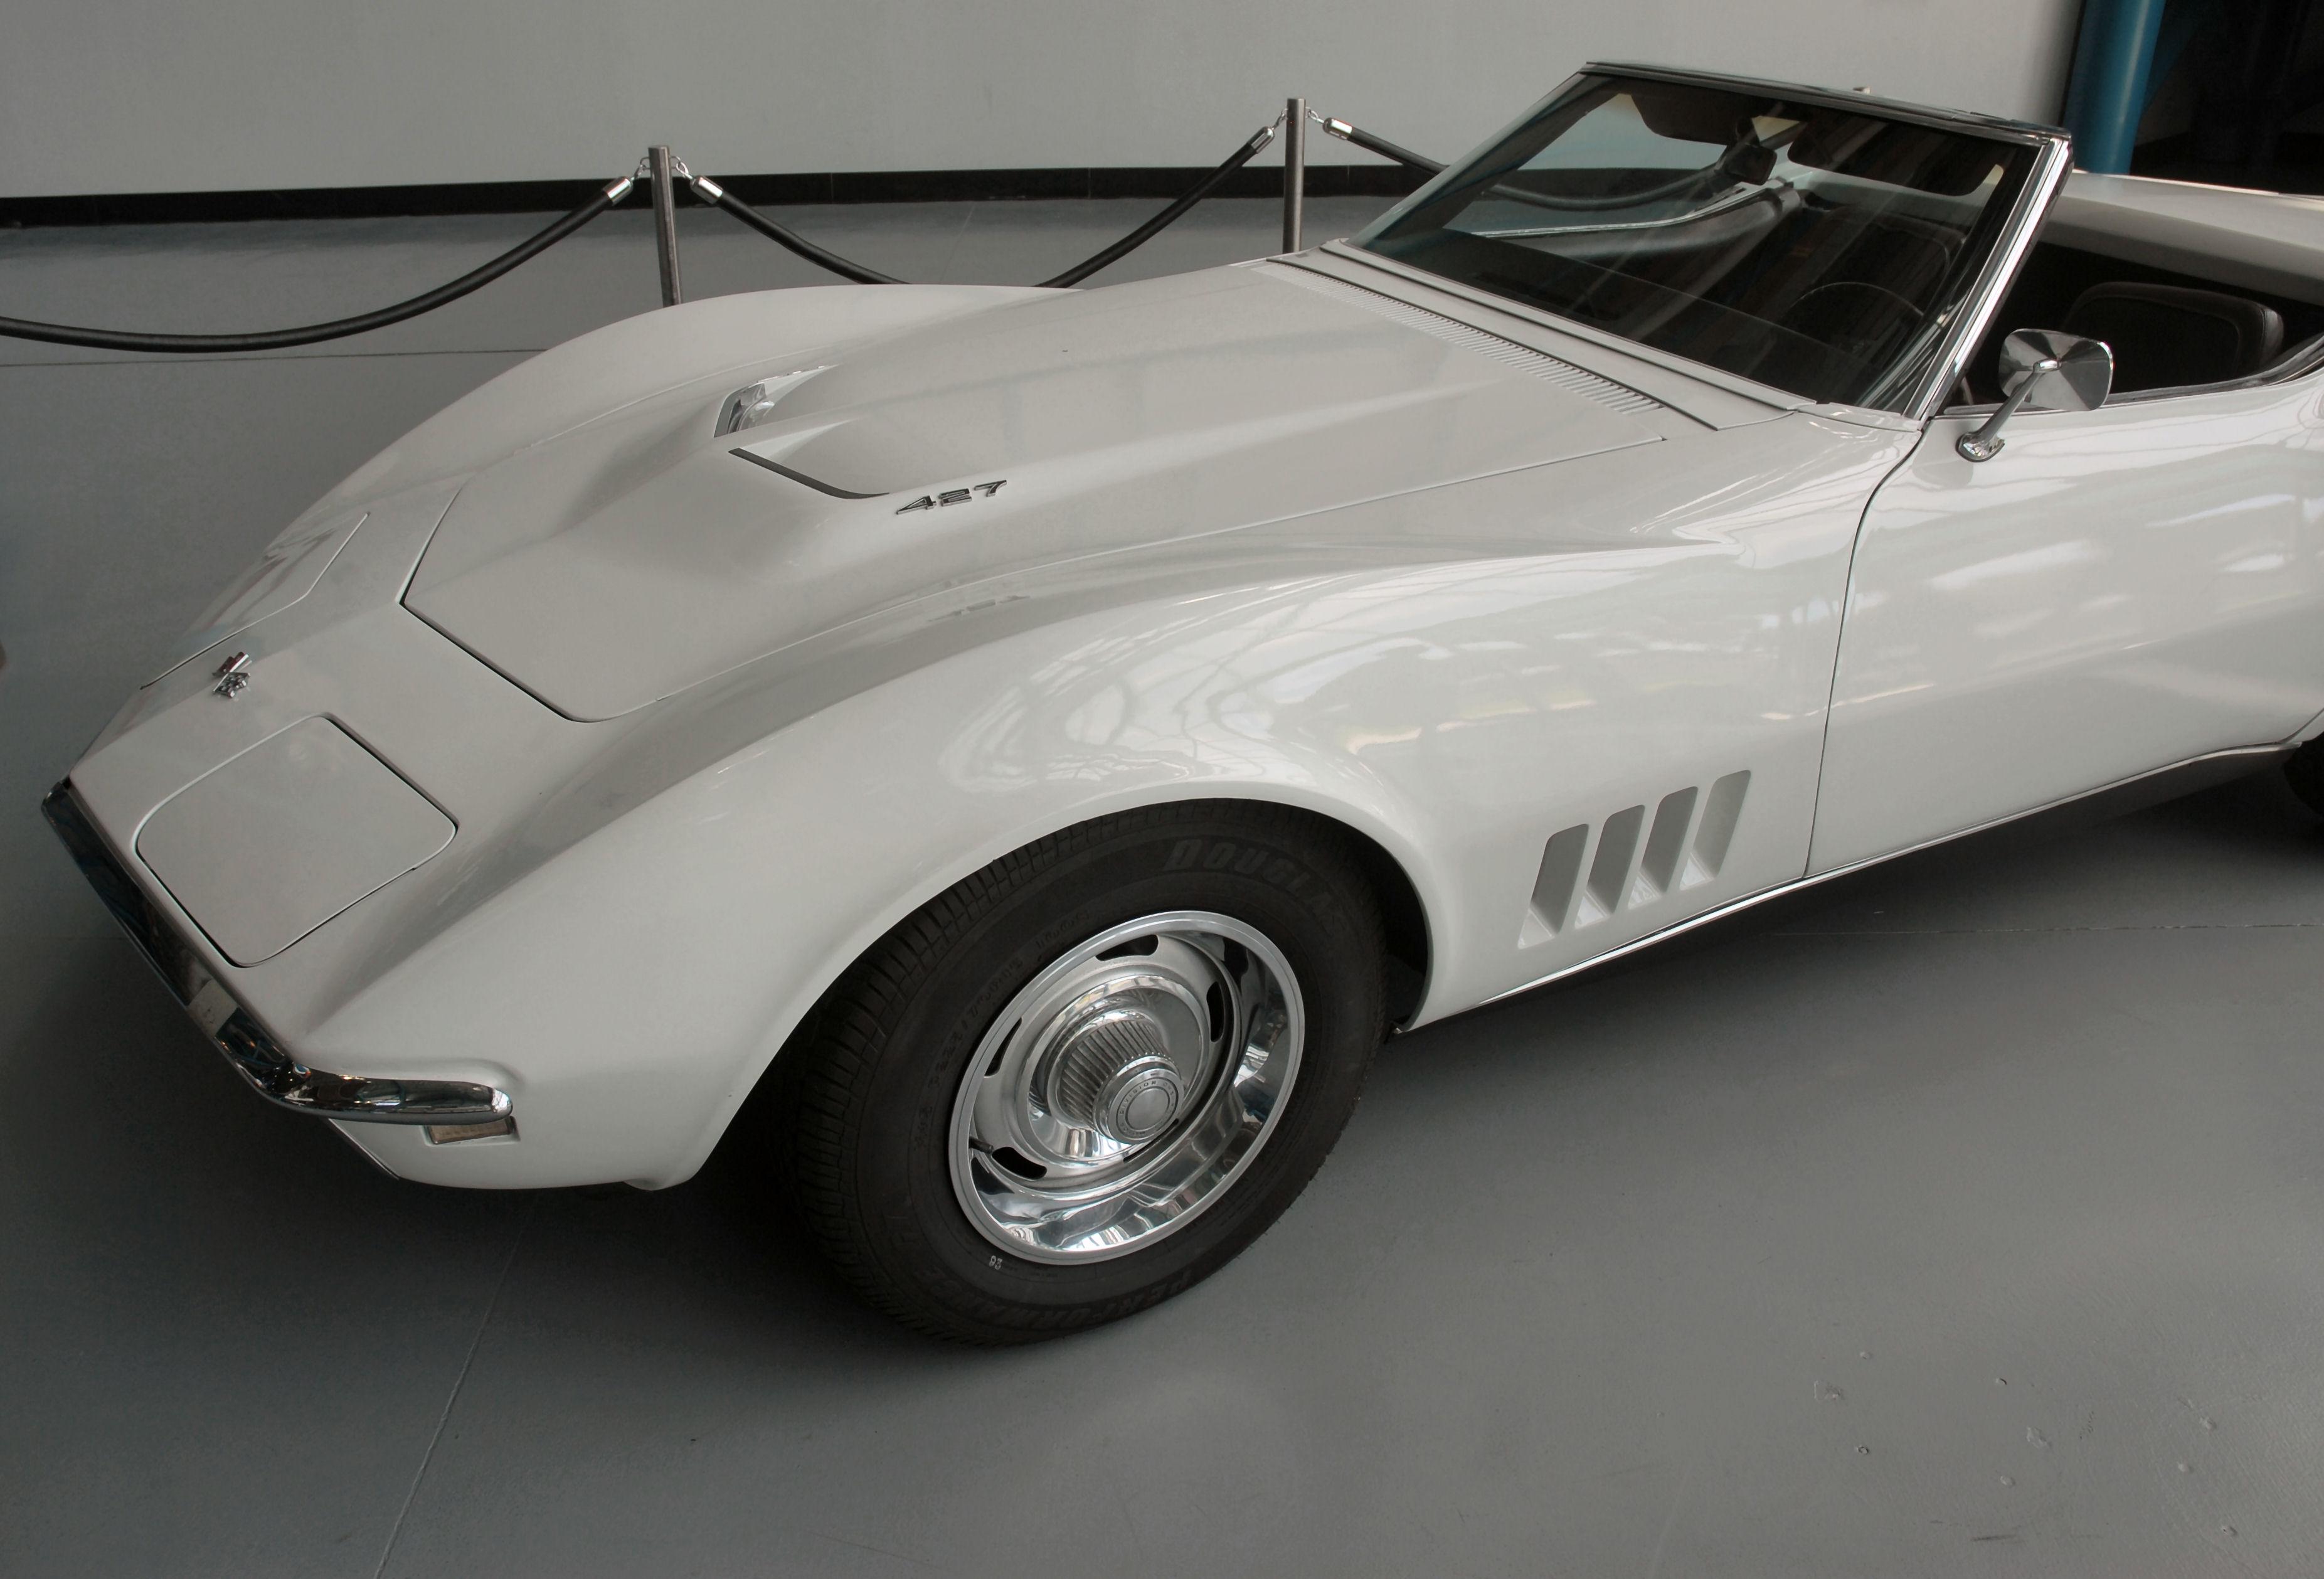 1966 Corvette Stingray >> Kennedy Space Center